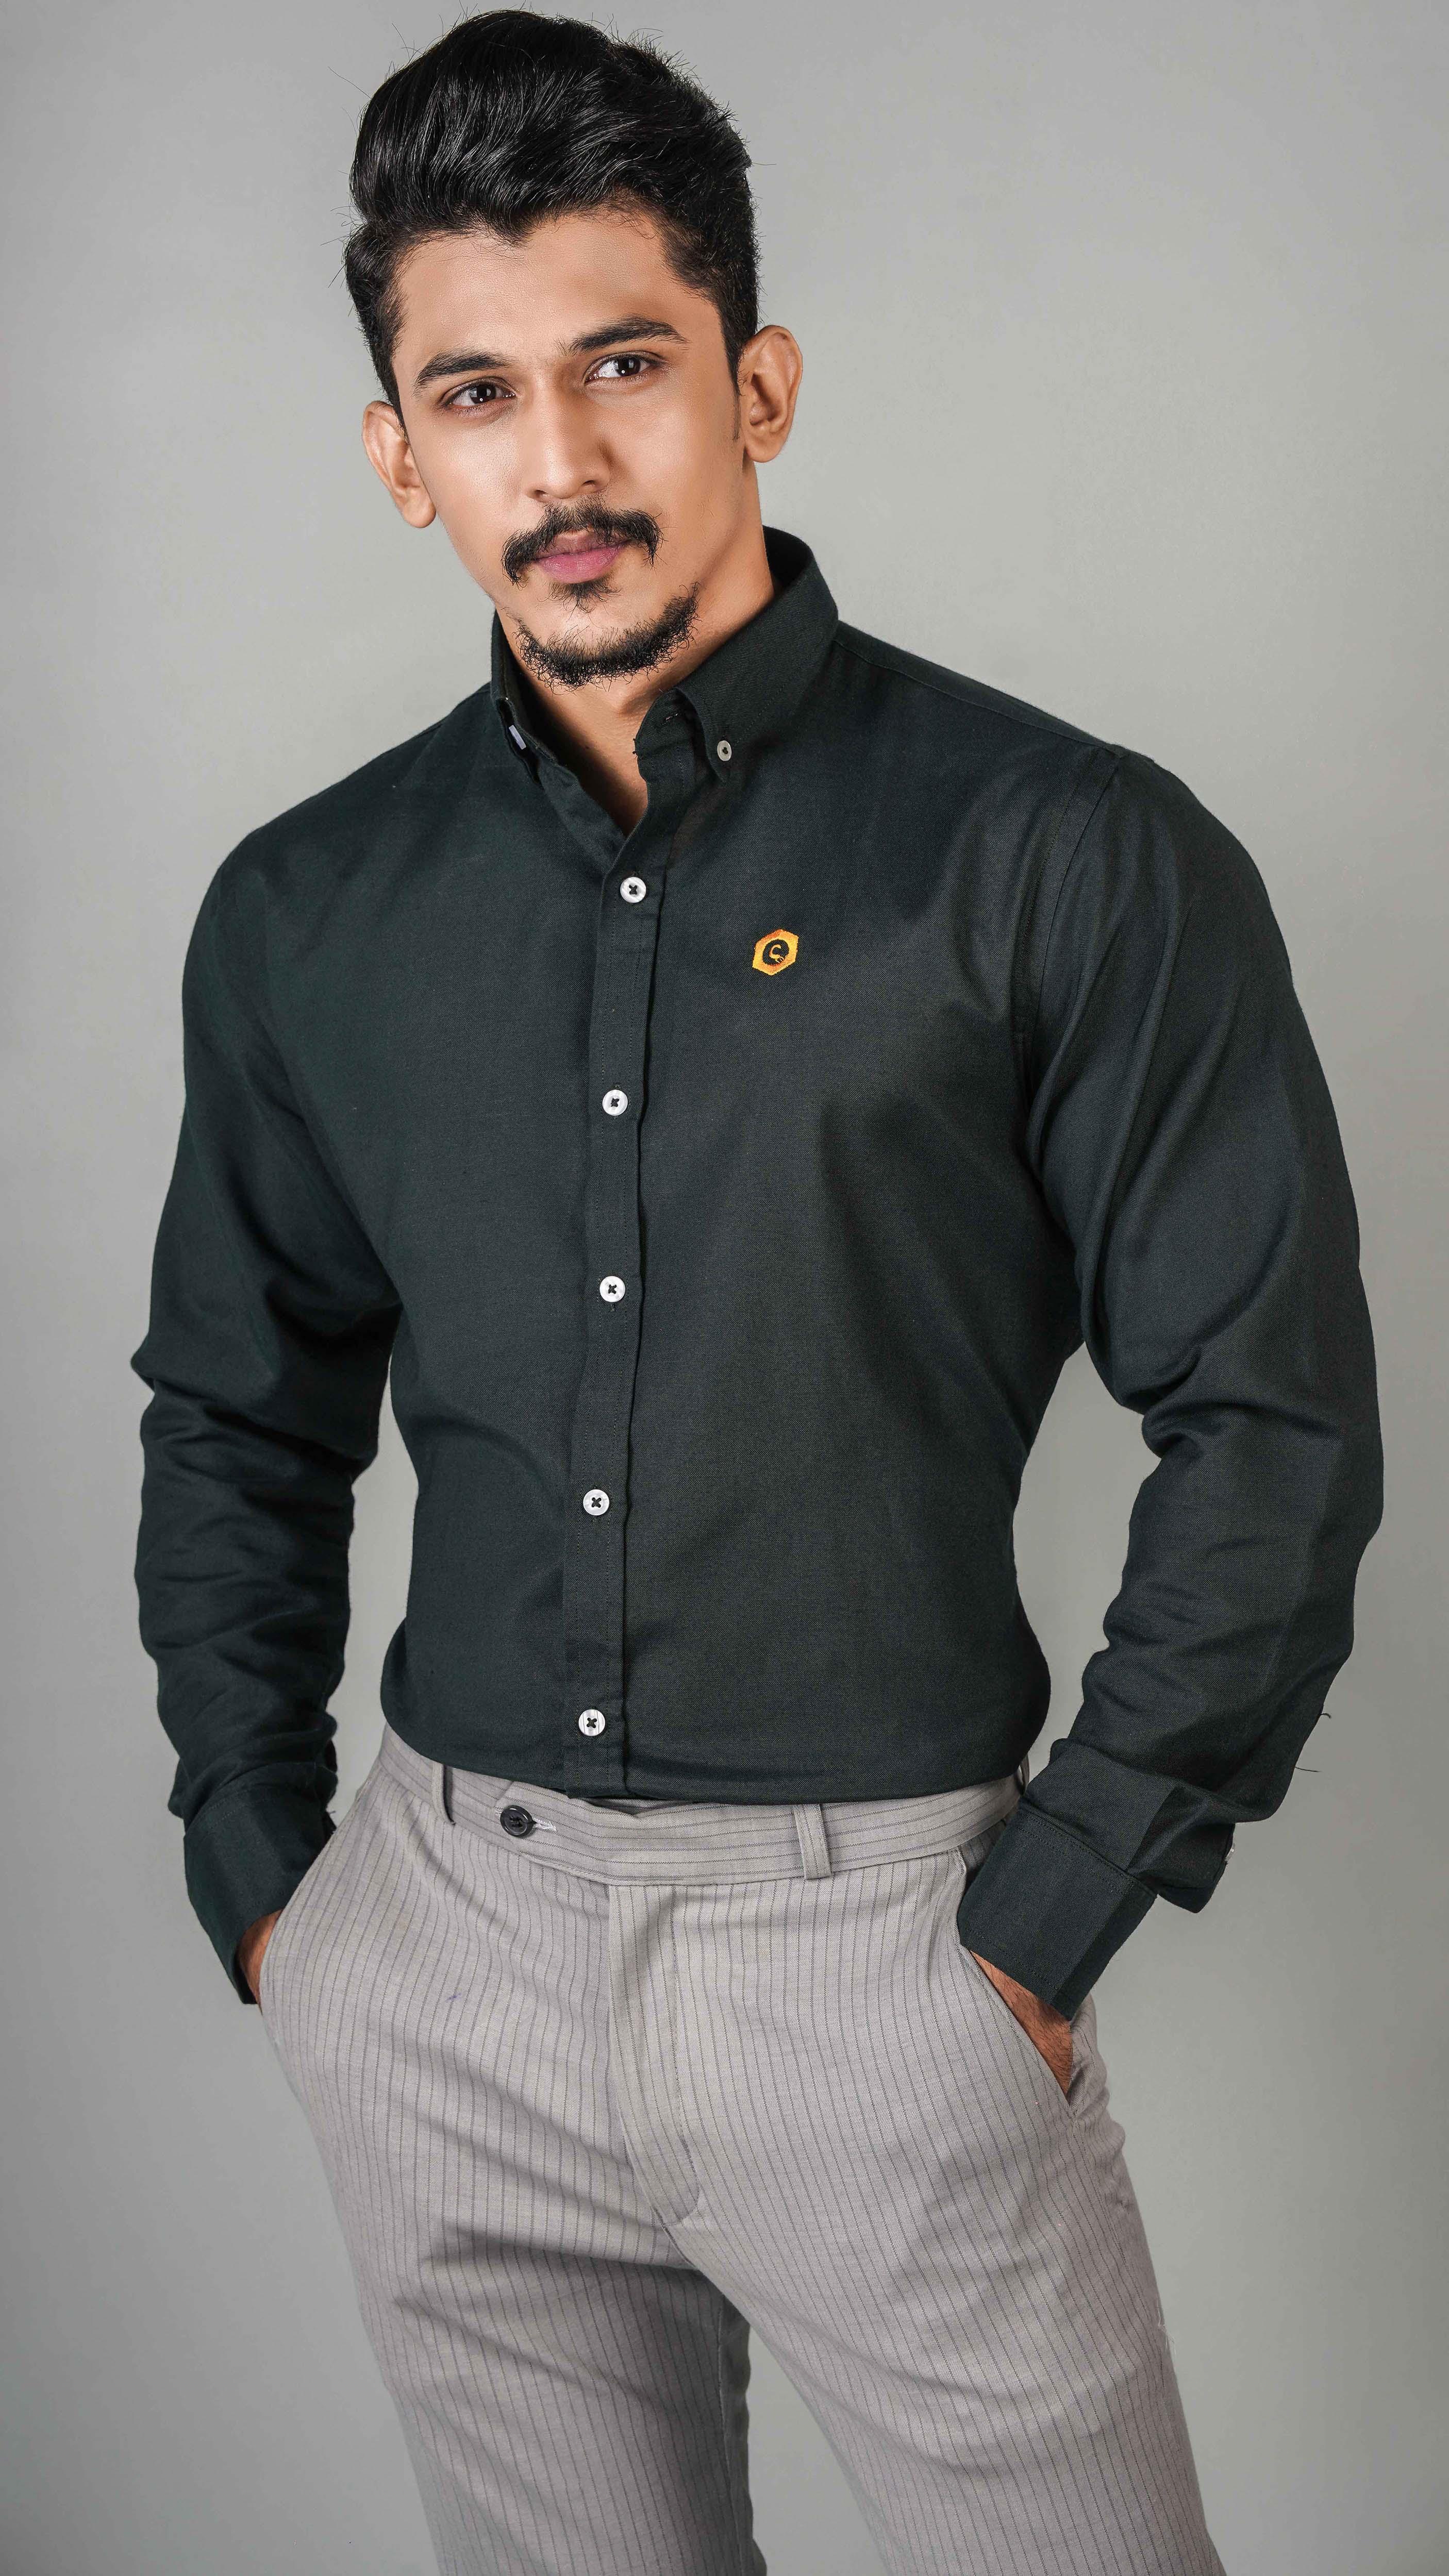 CODE Casual Slim Fit Cotton Long Sleeve Blue Printed Shirt For Men Fashion SKU: CD-20